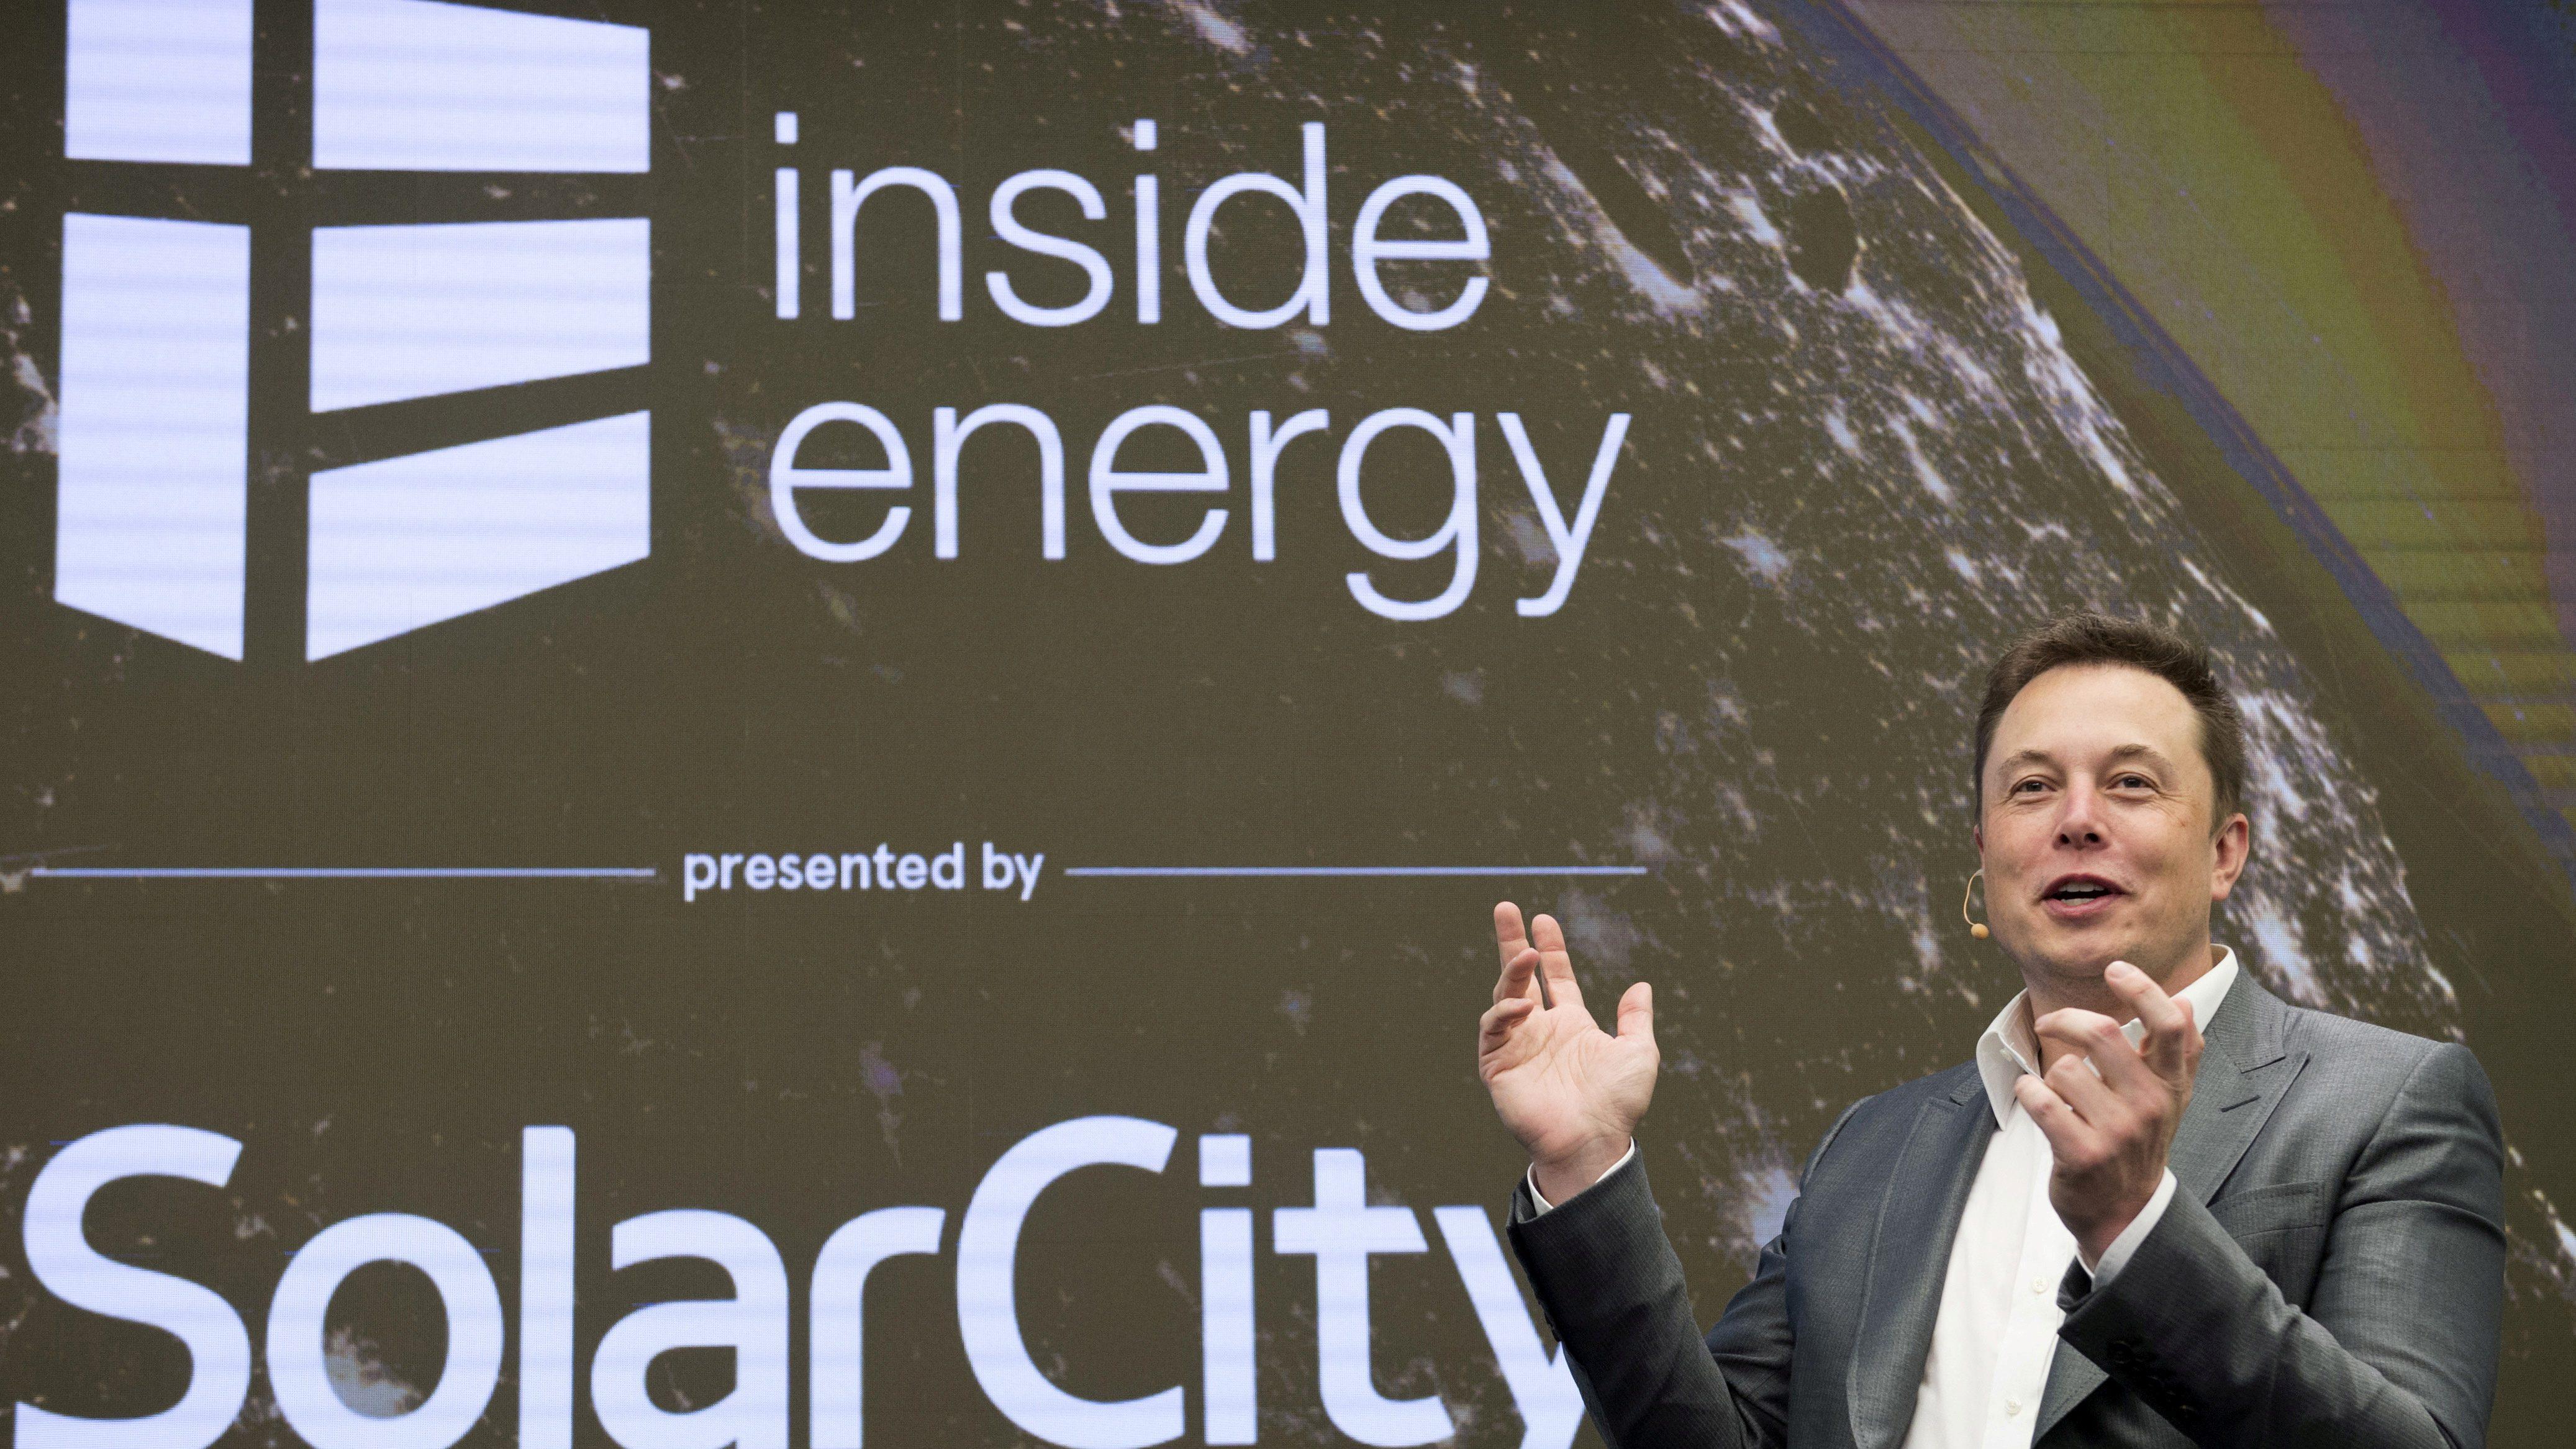 Elon Musk, Chairman of SolarCity and CEO of Tesla Motors, speaks at SolarCityÕs Inside Energy Summit in Manhattan, New York October 2, 2015. REUTERS/Rashid Umar Abbasi/File Photo - RTSKHHA